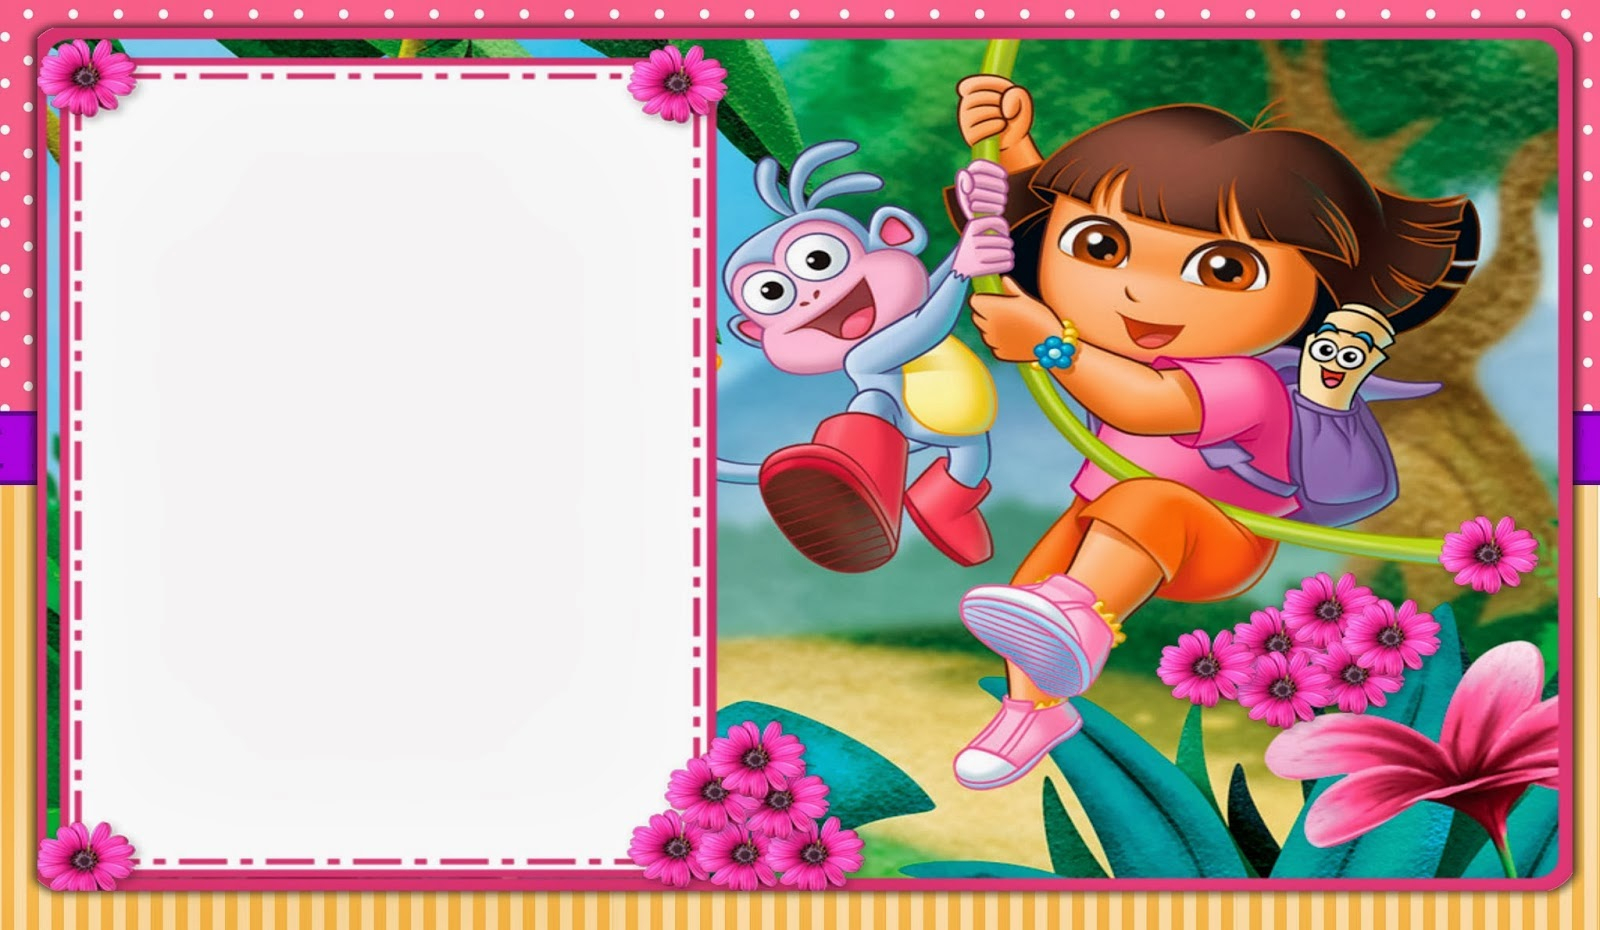 Dora The Explorer: Free Printable Invitations, Boxes And Party - Dora Birthday Cards Free Printable